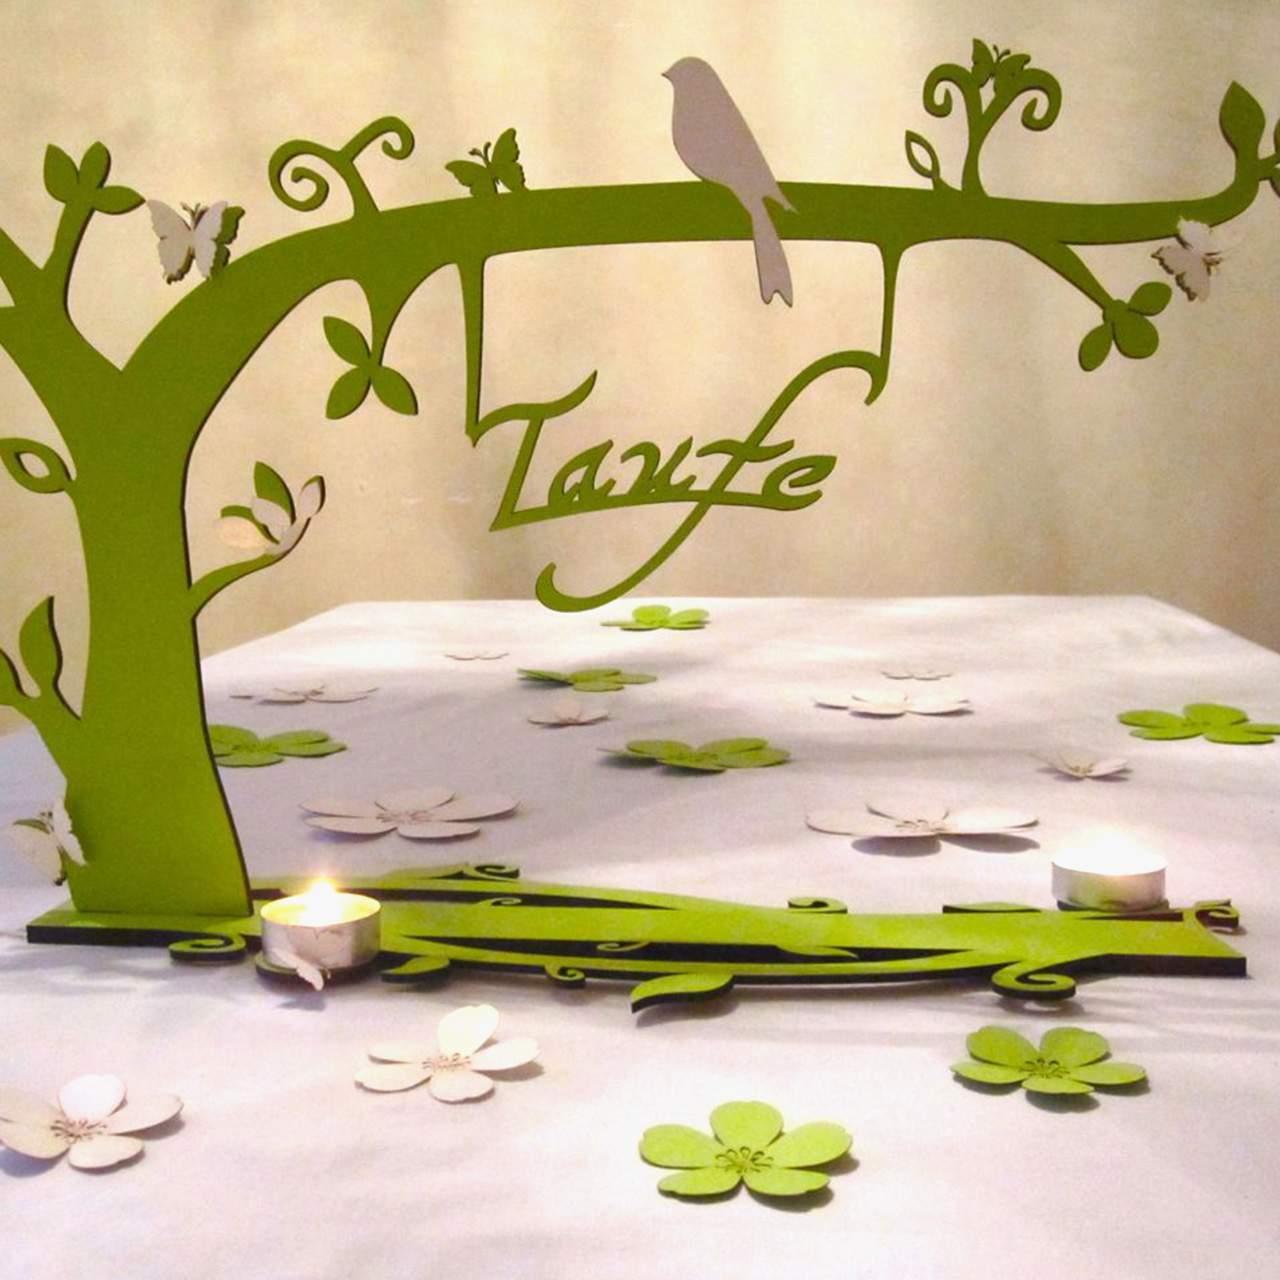 garten art elegant tischdeko bezaubernder garten grun of garten art